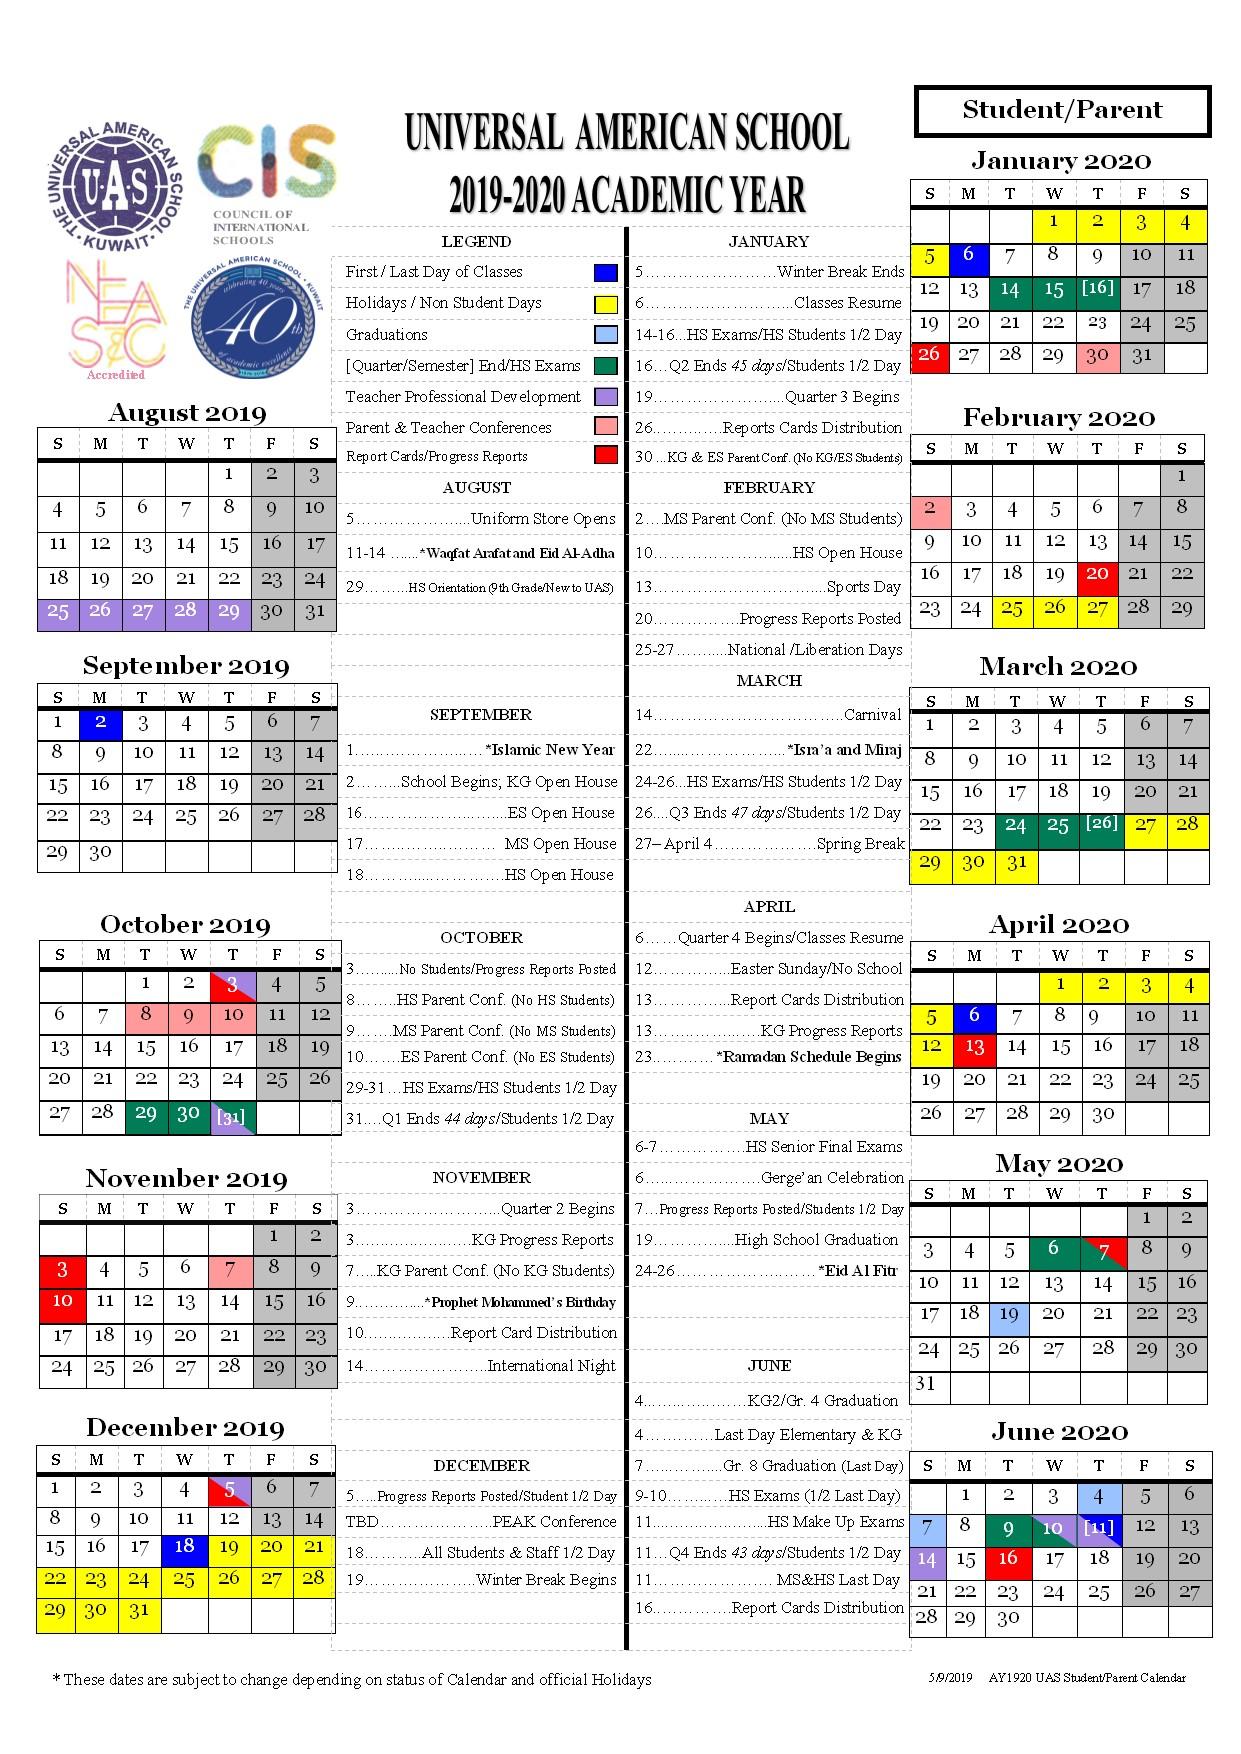 2020 2020 Calendar.Students Calendar 2019 2020 Universal American School